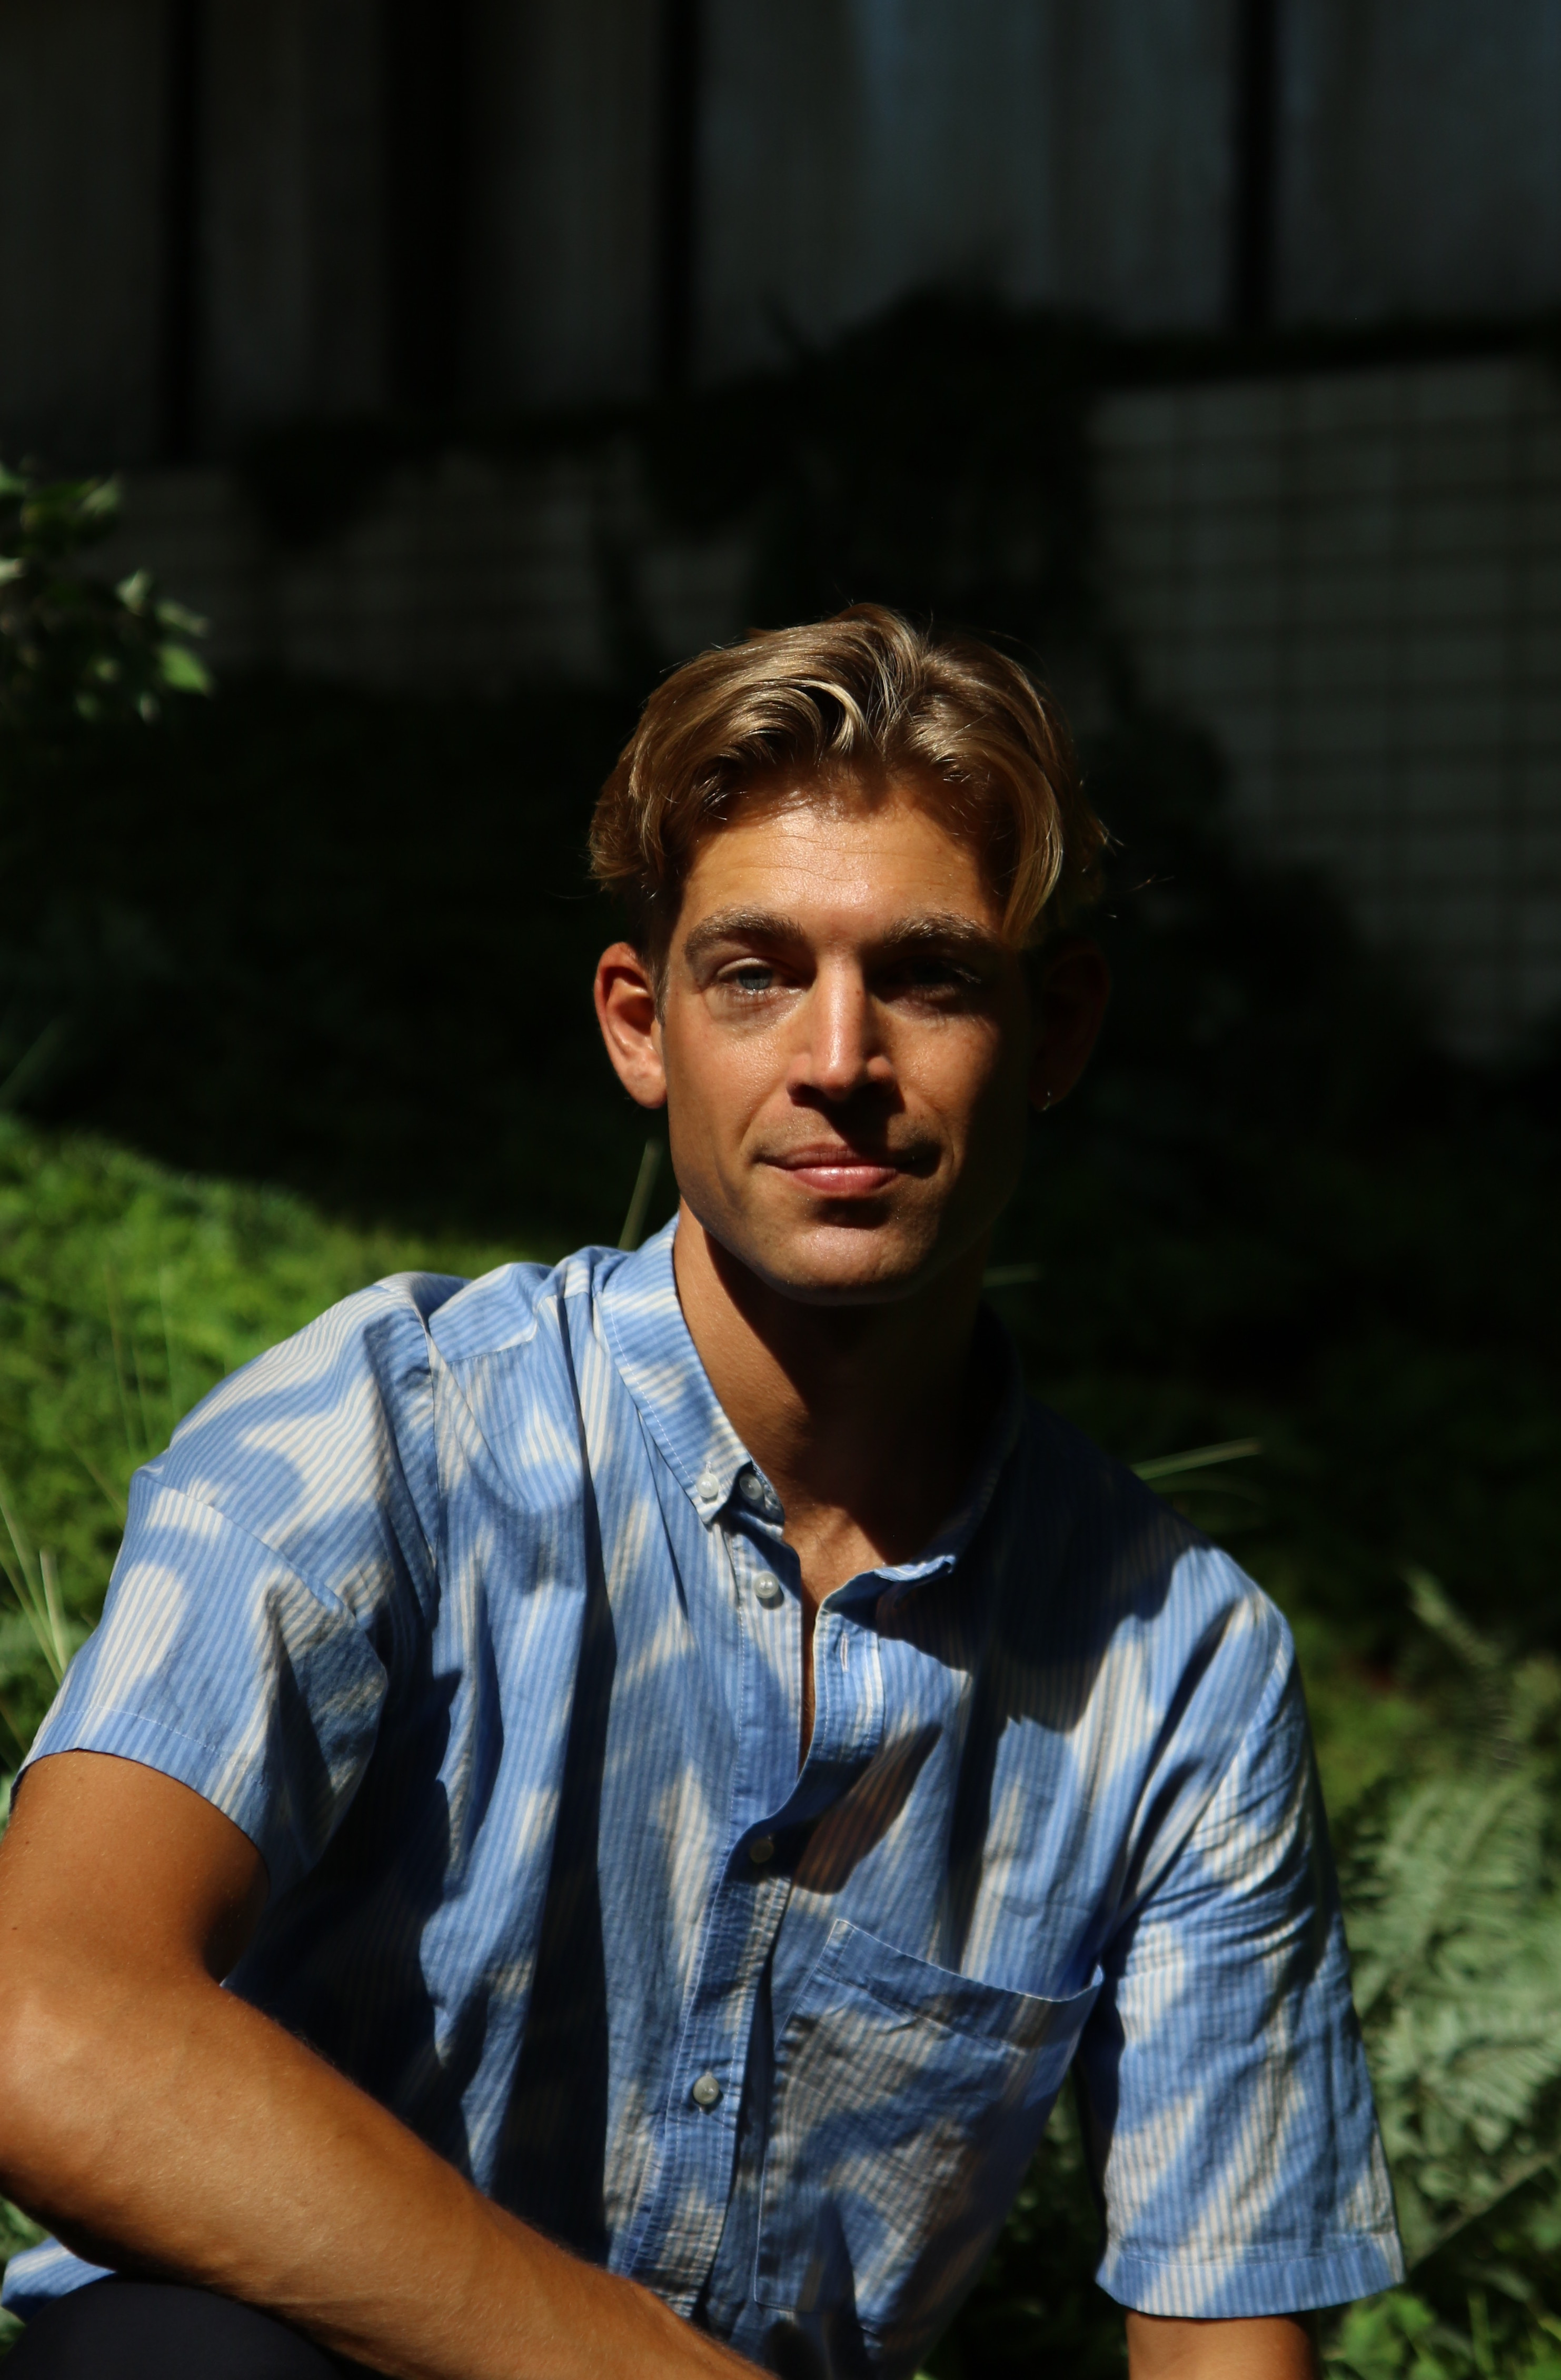 Green Behavior - Daniel Flendt Dreesen